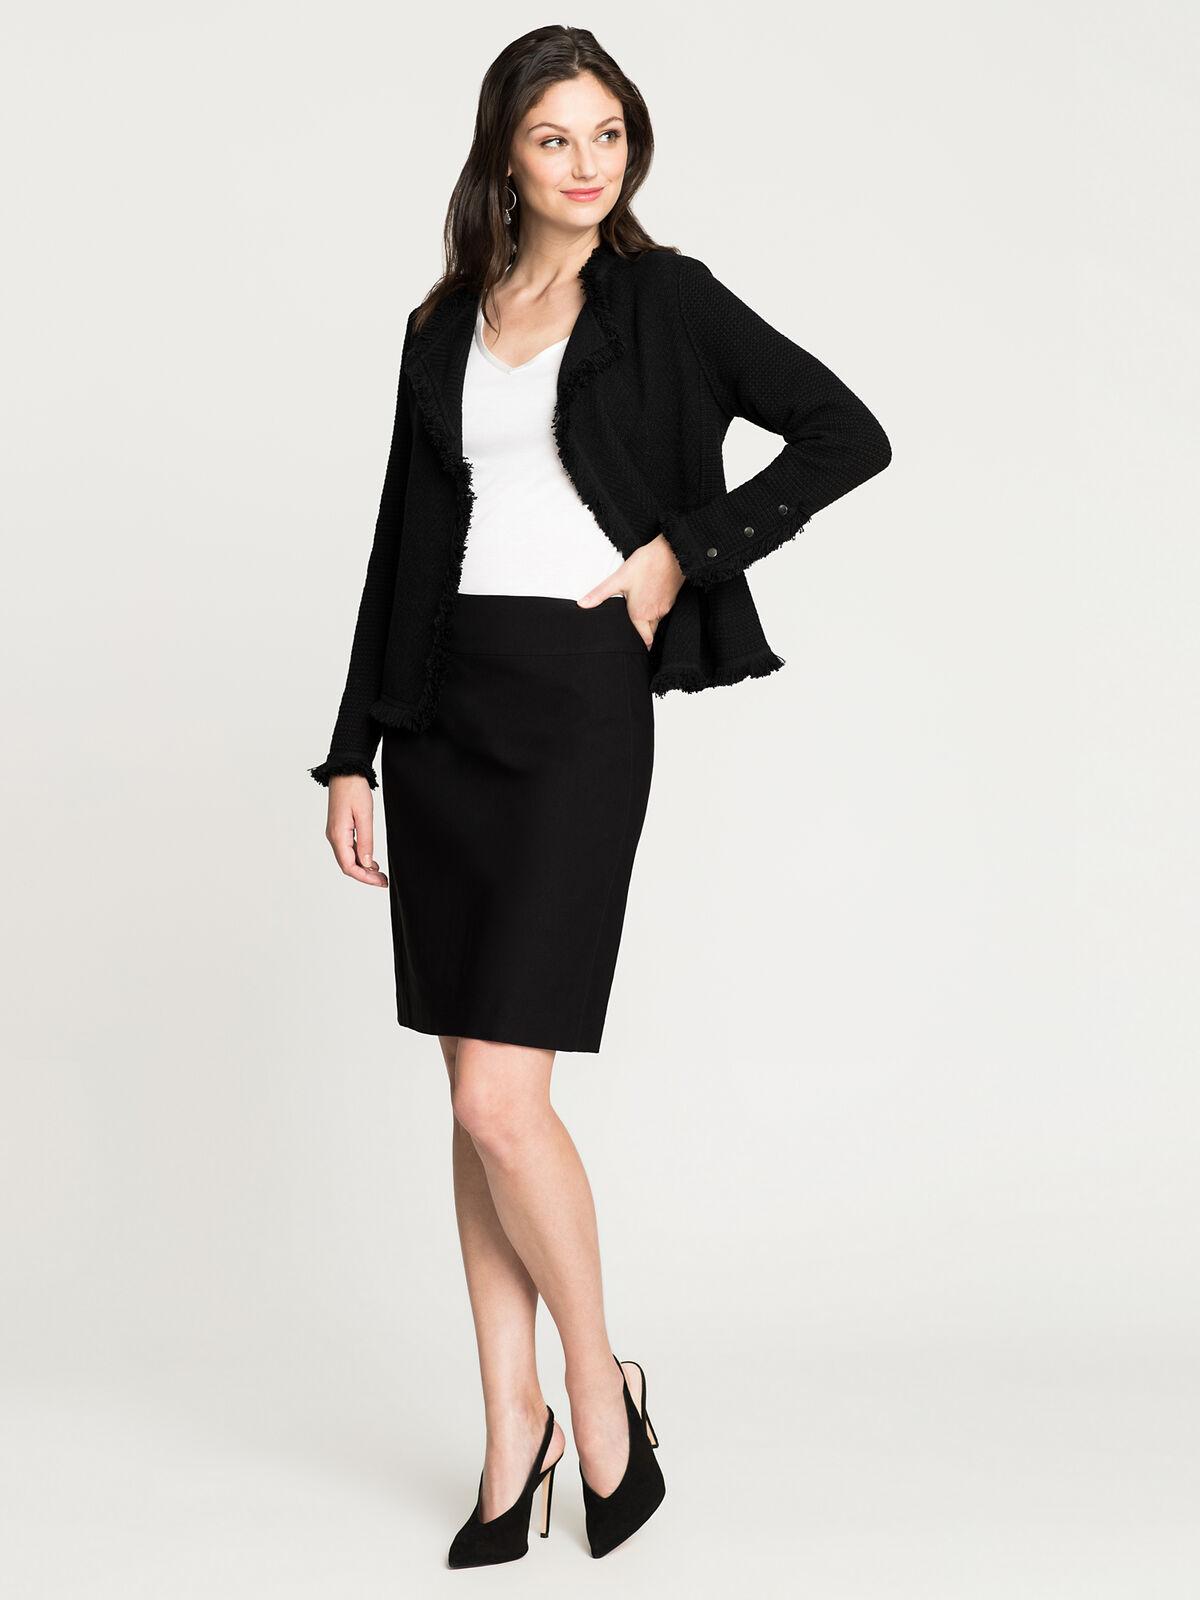 Wonderstretch Skirt